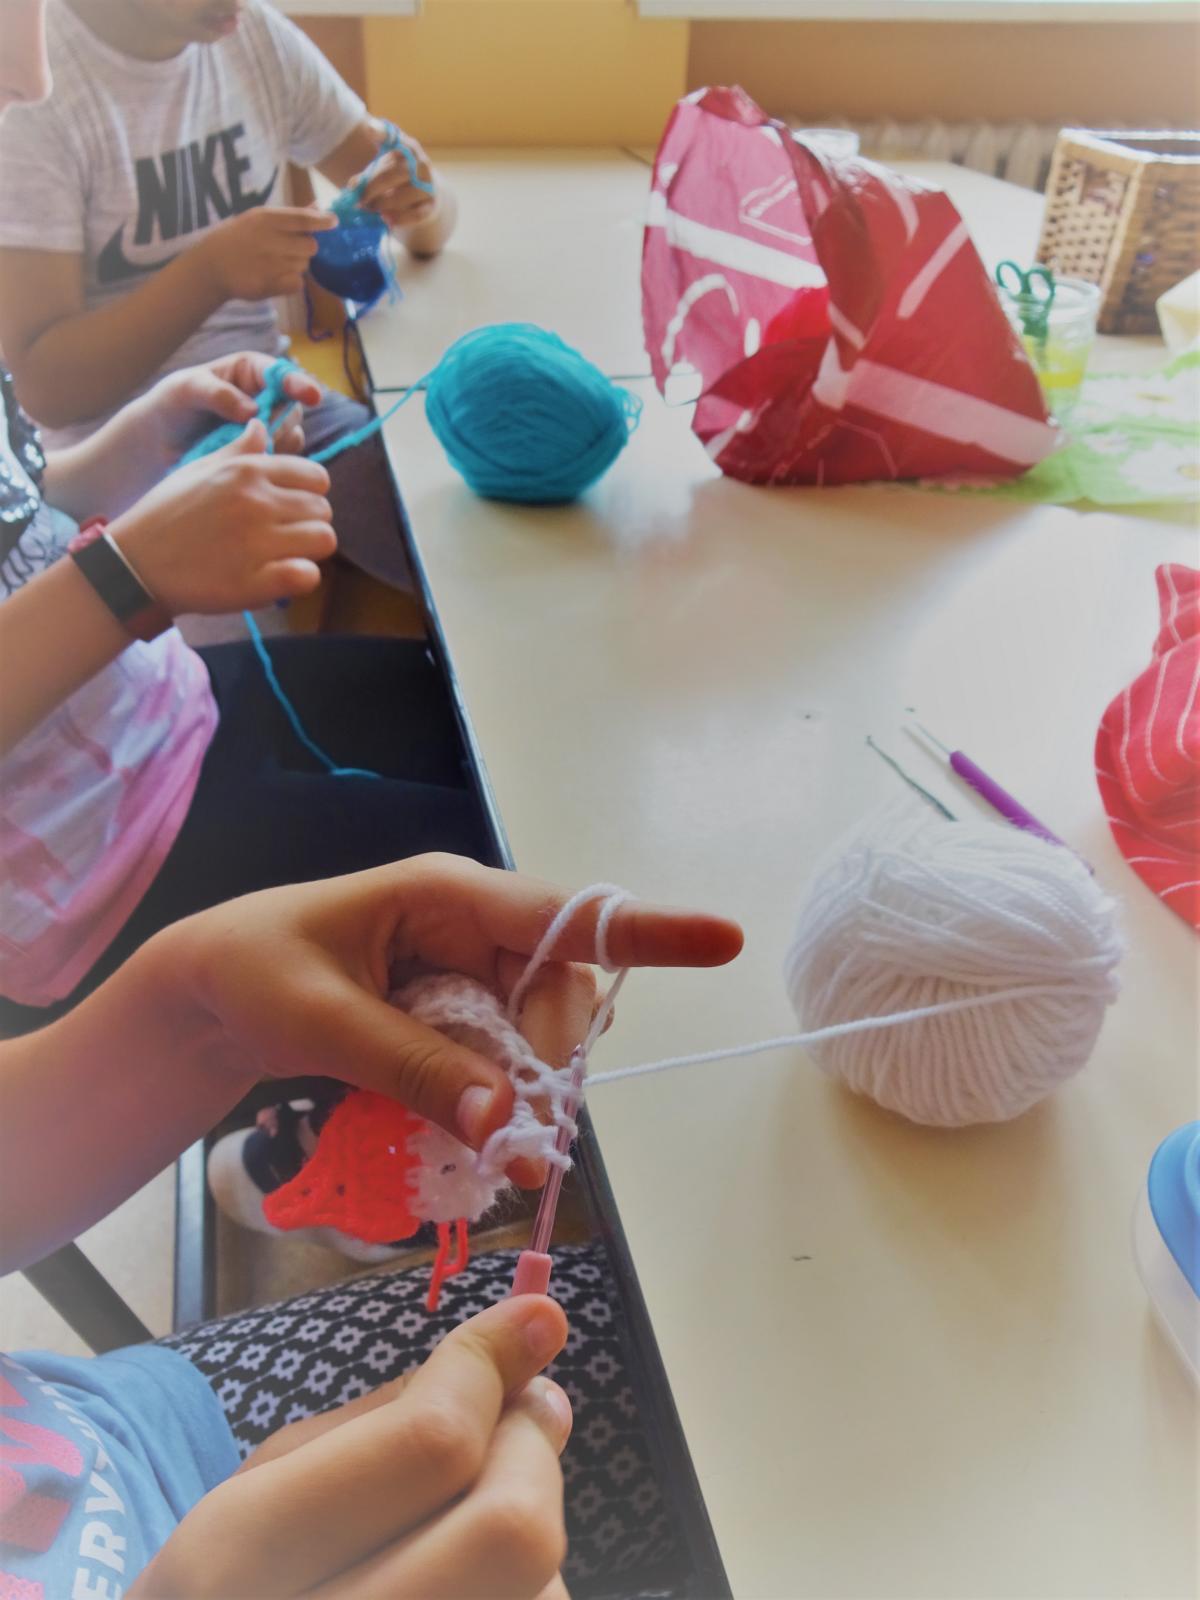 Grundschule Bodenrode Wolle Und Stoff Primolode